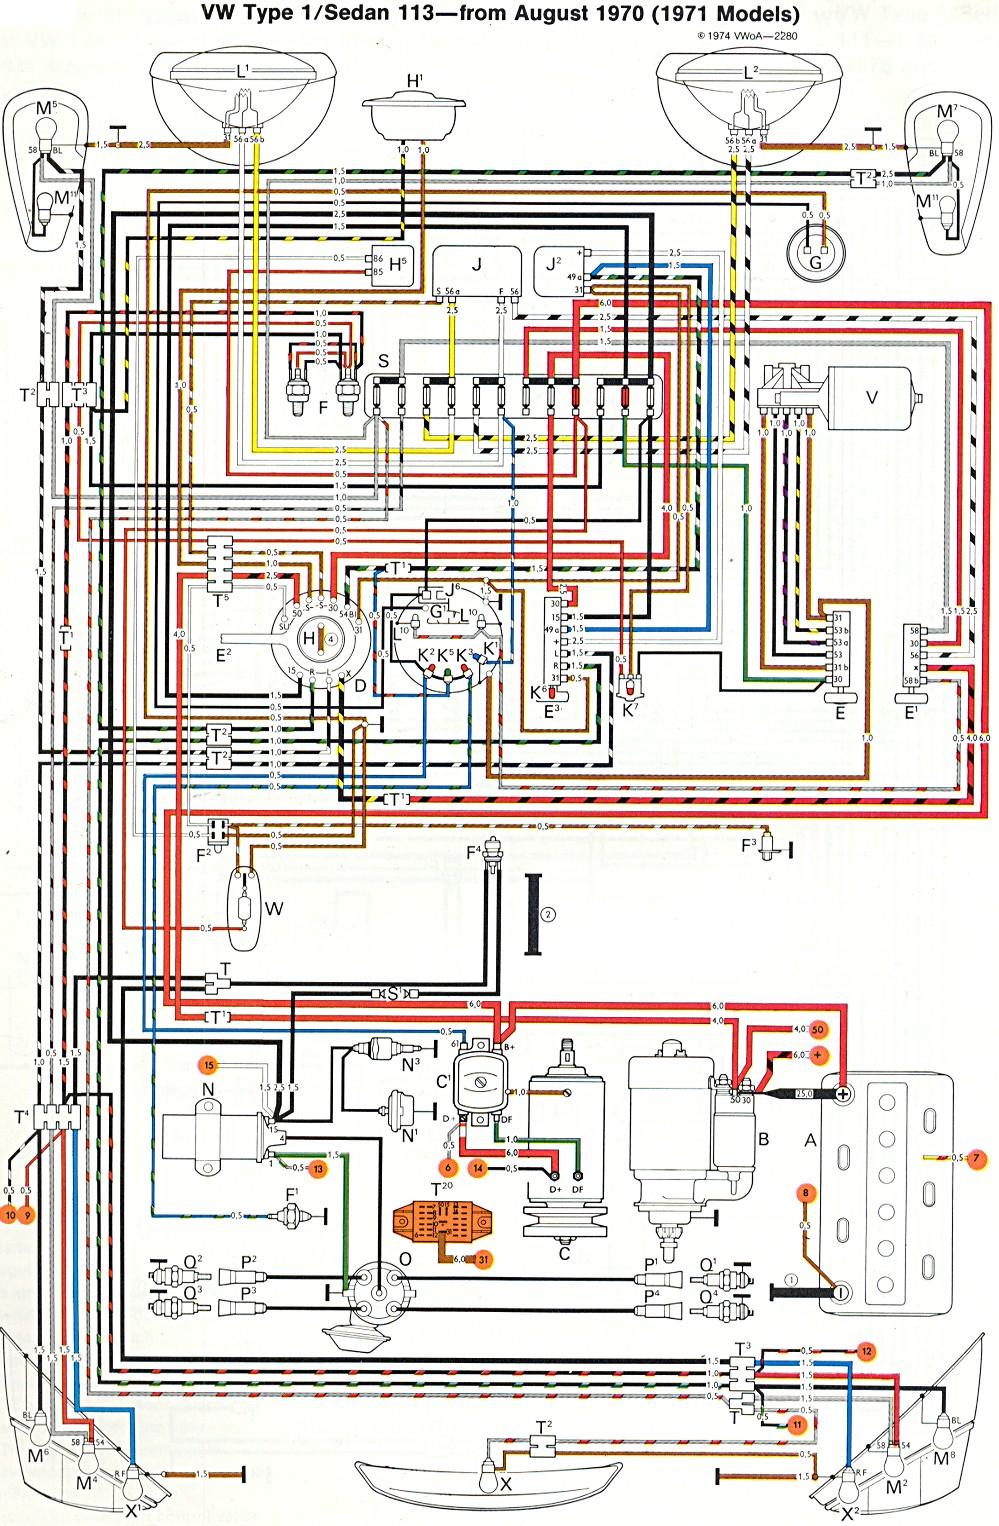 1973 Vw Super Beetle Engine Wiring Diagram Wiring Diagram Frame Frame Cfcarsnoleggio It